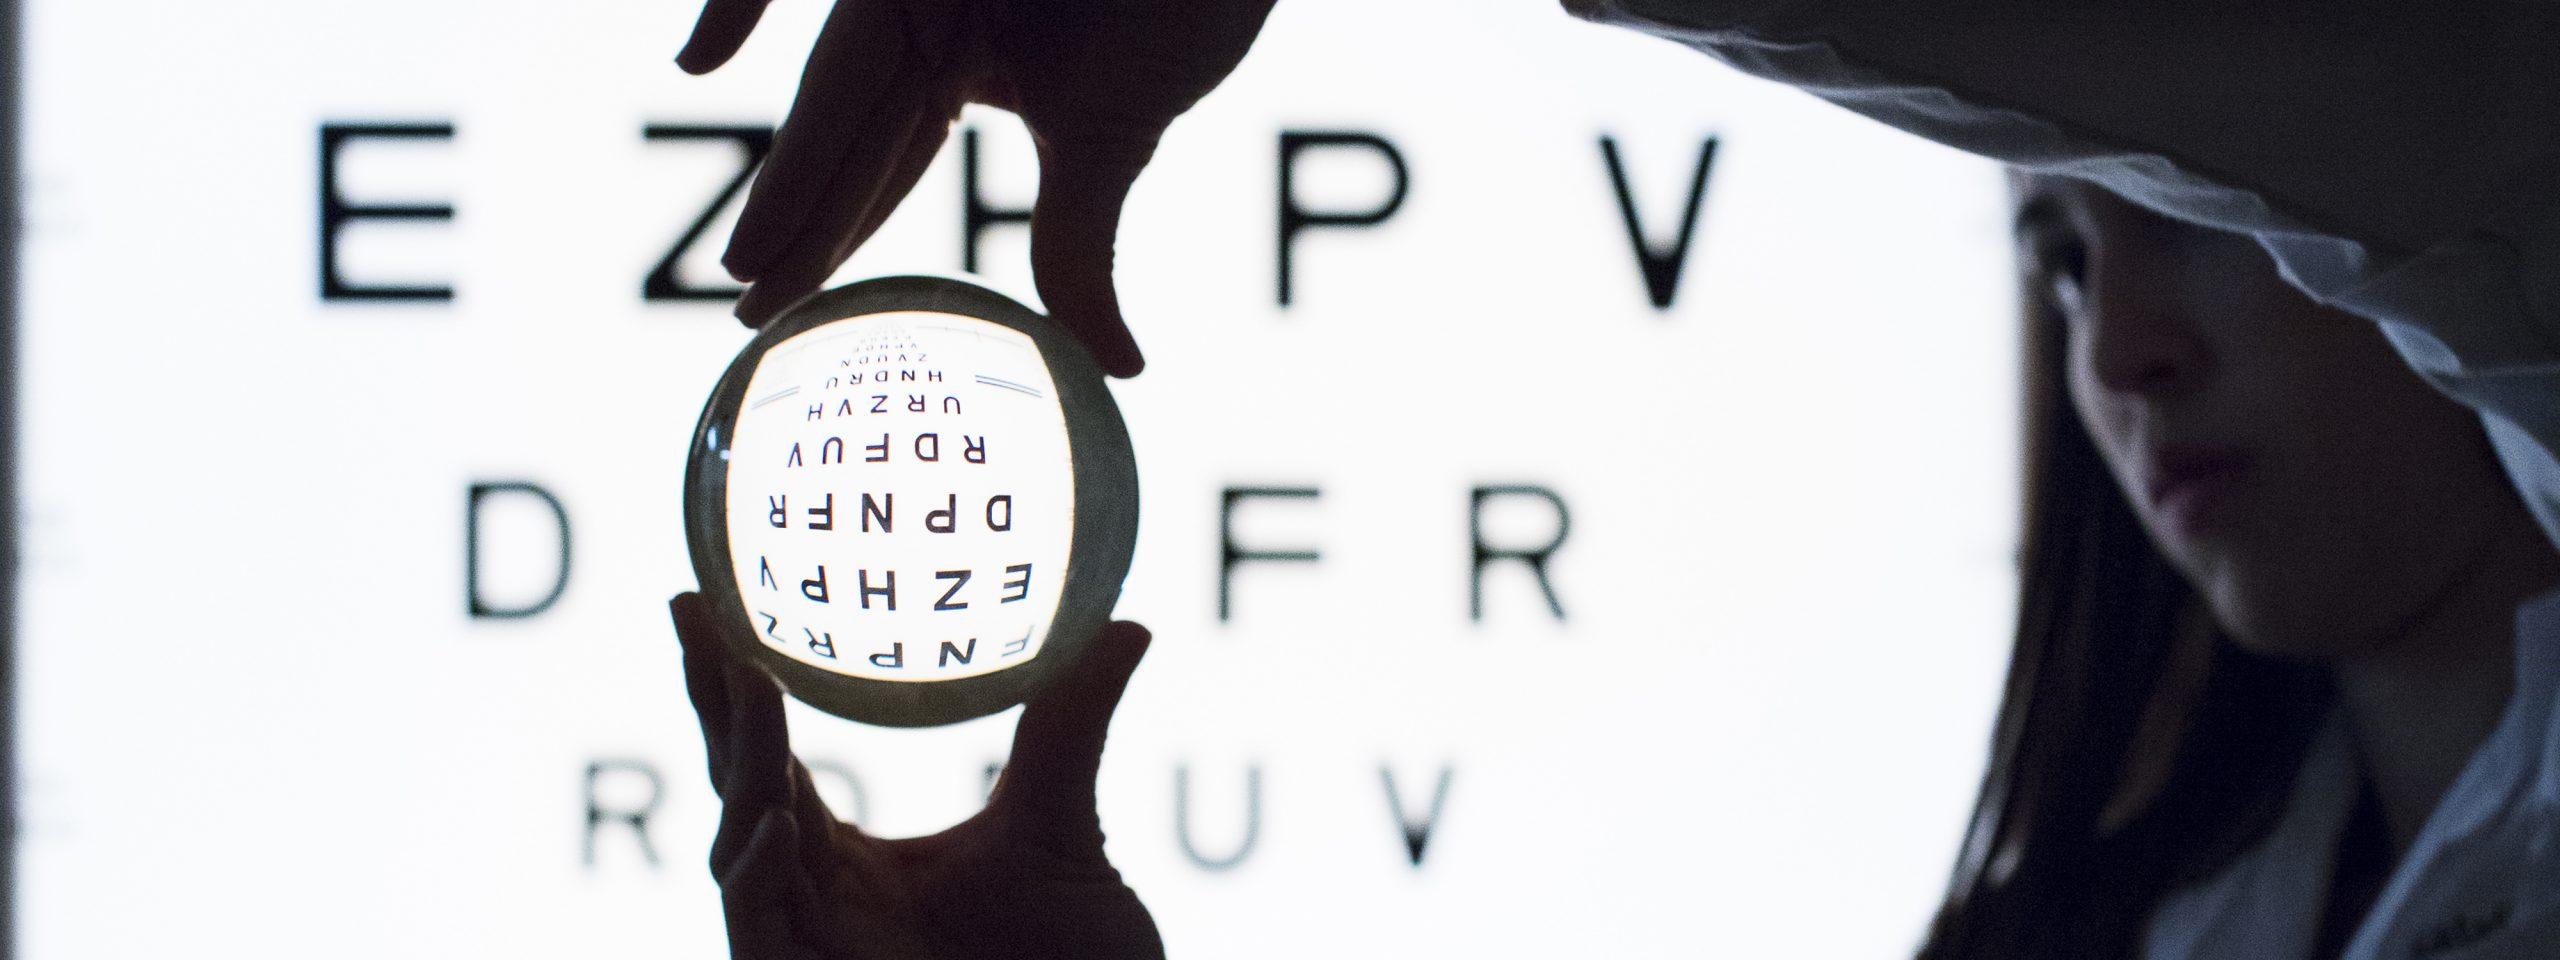 Female optometrist hold lens in front of illuminated eye chart.